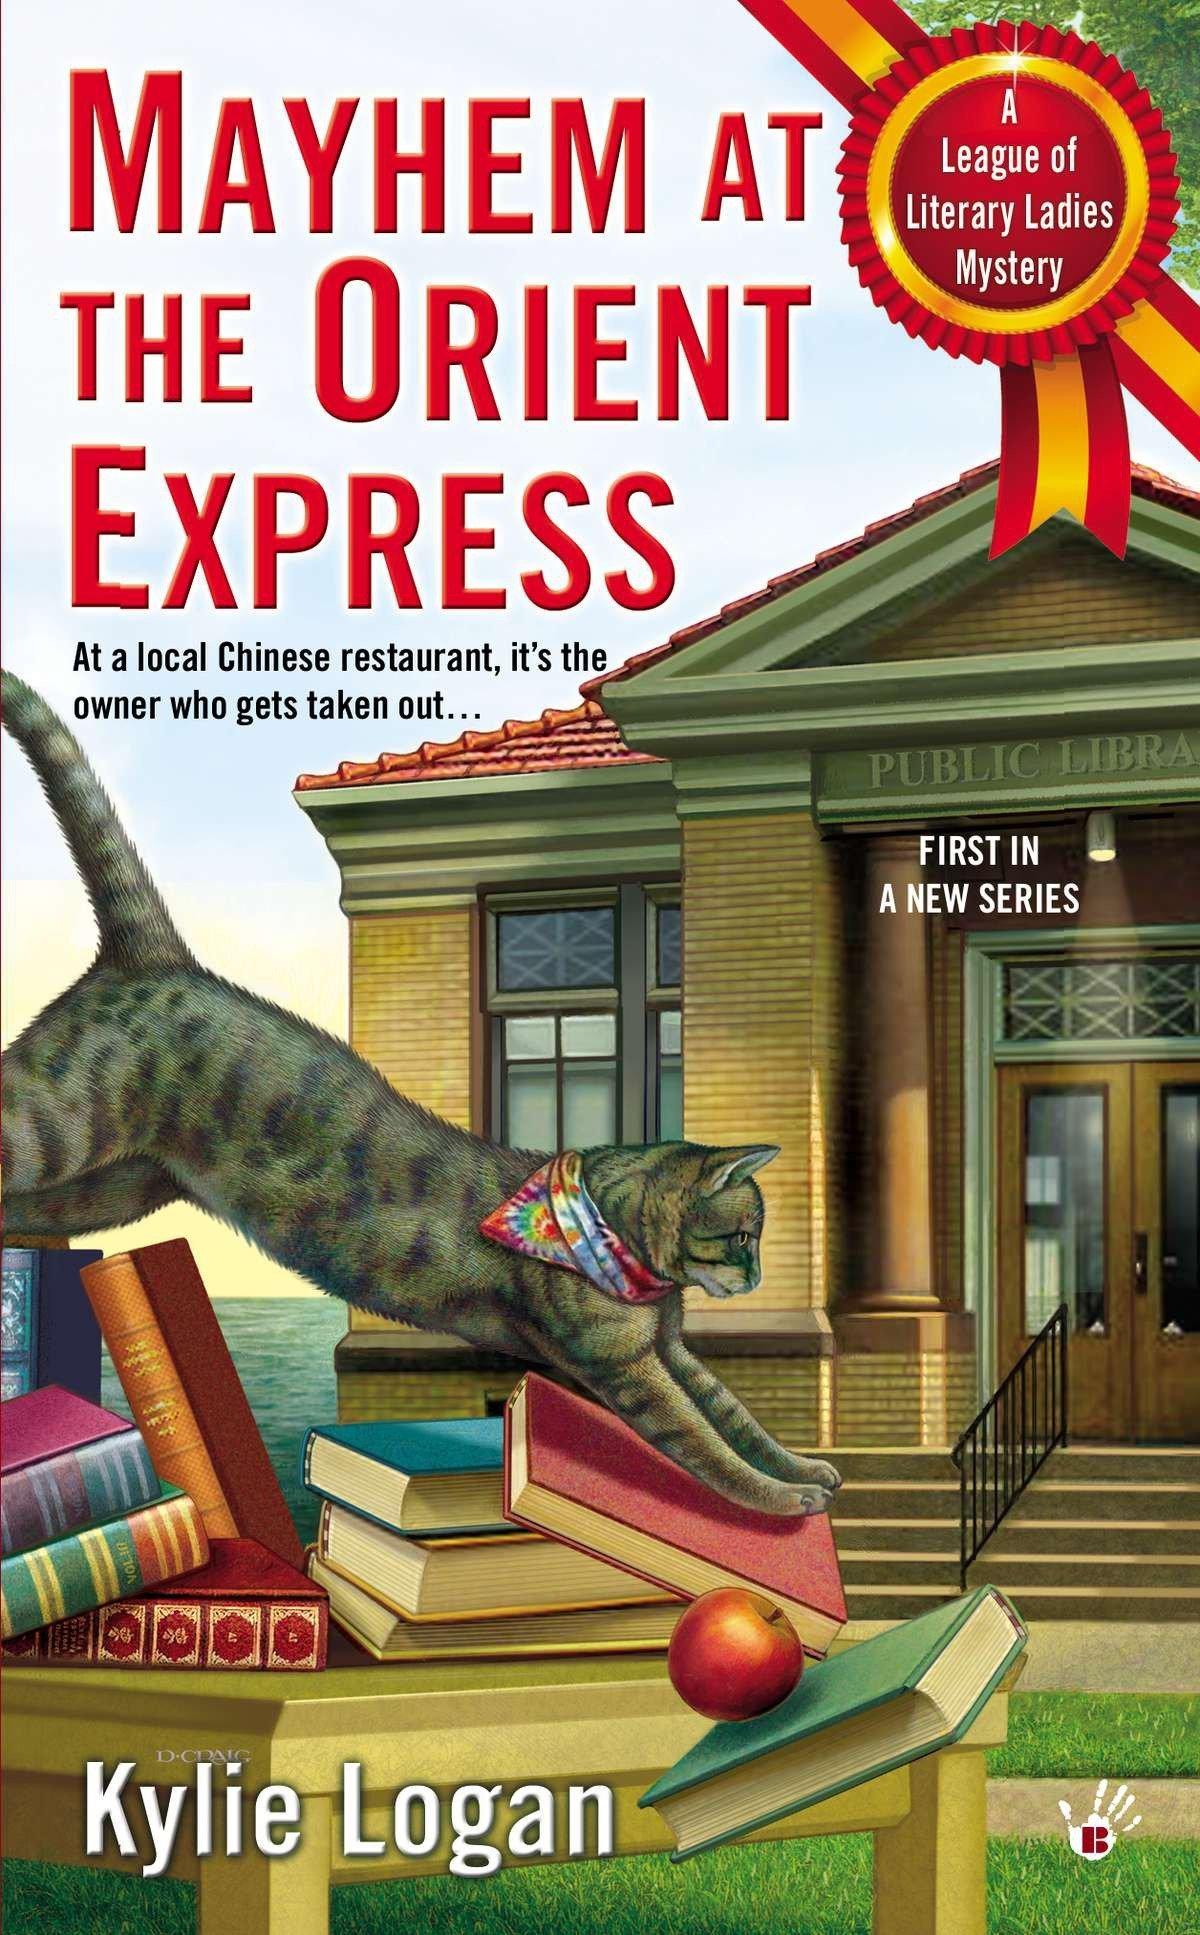 Amazon.com: Mayhem at the Orient Express (League of Literary Ladies)  (9780425257753): Kylie Logan: Books